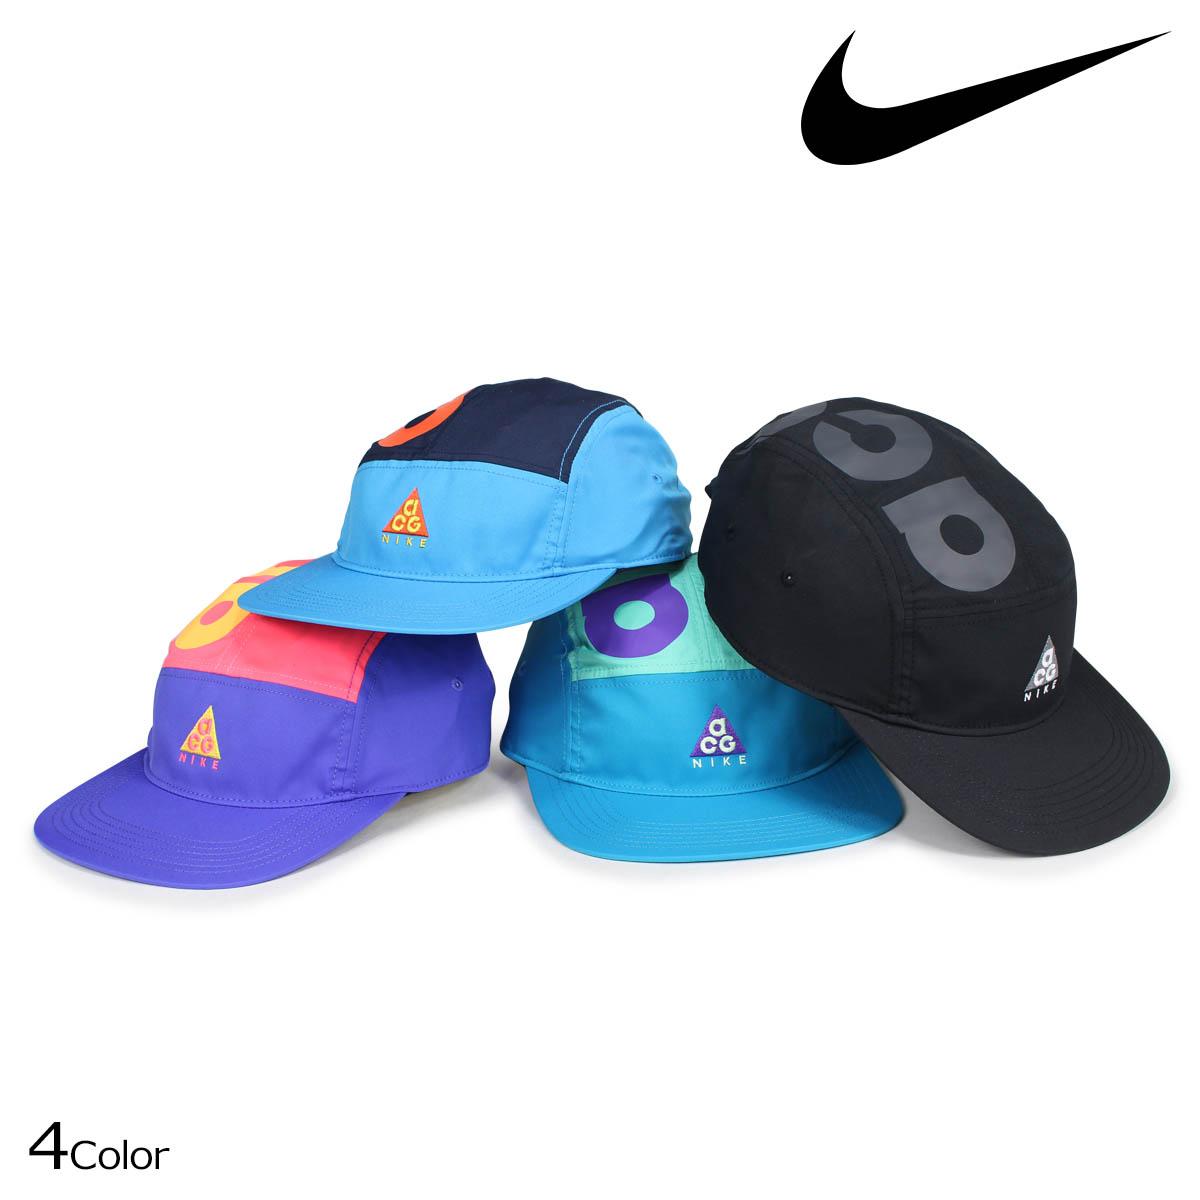 NIKE ACG DRY AW84 CAP Nike cap hat men gap Dis AO2104  9 25 Shinnyu load  76933fc1f1b